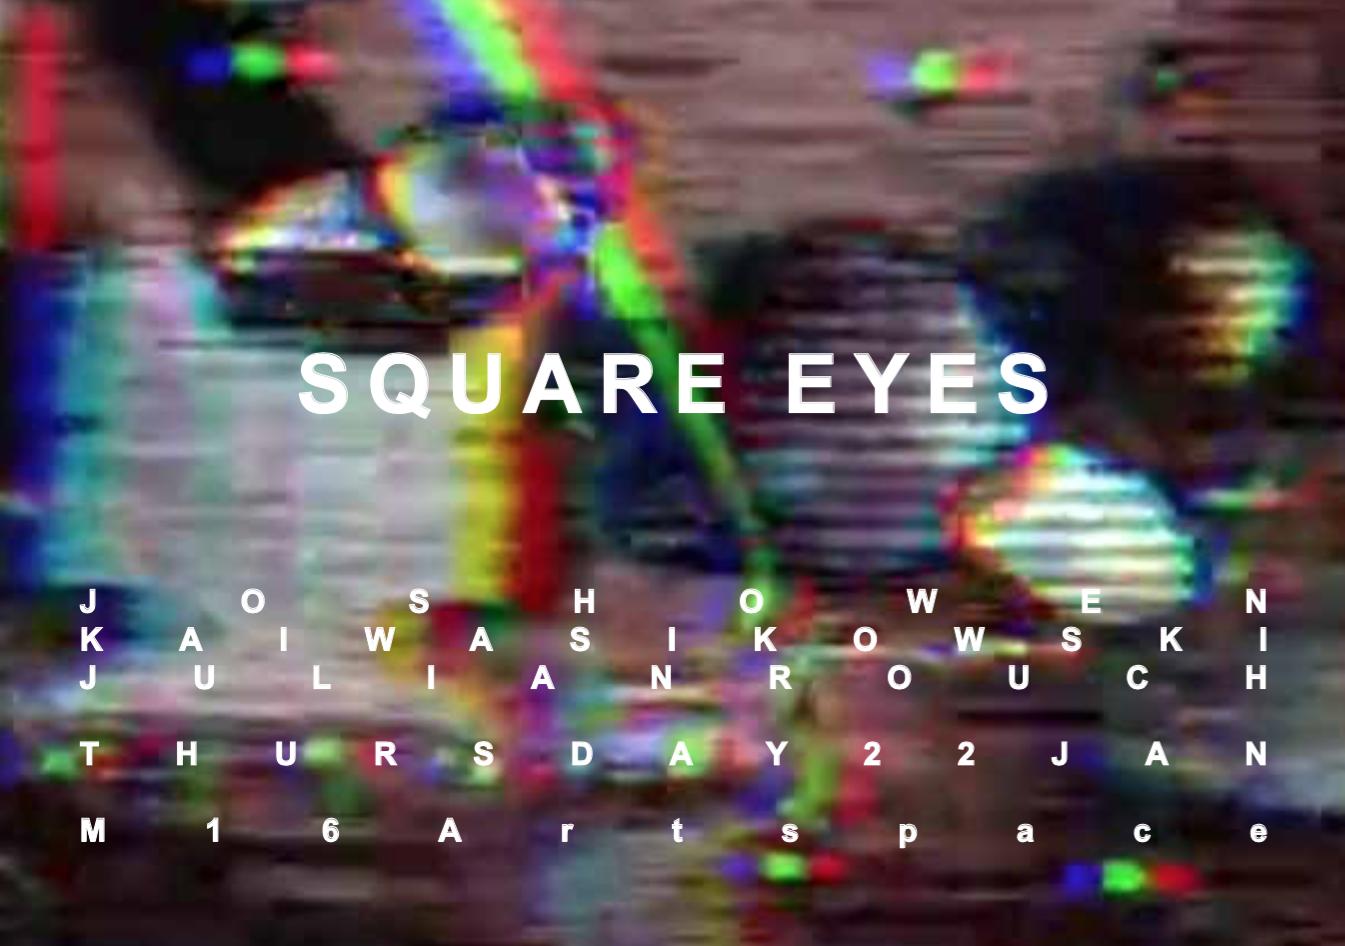 Squareeyes